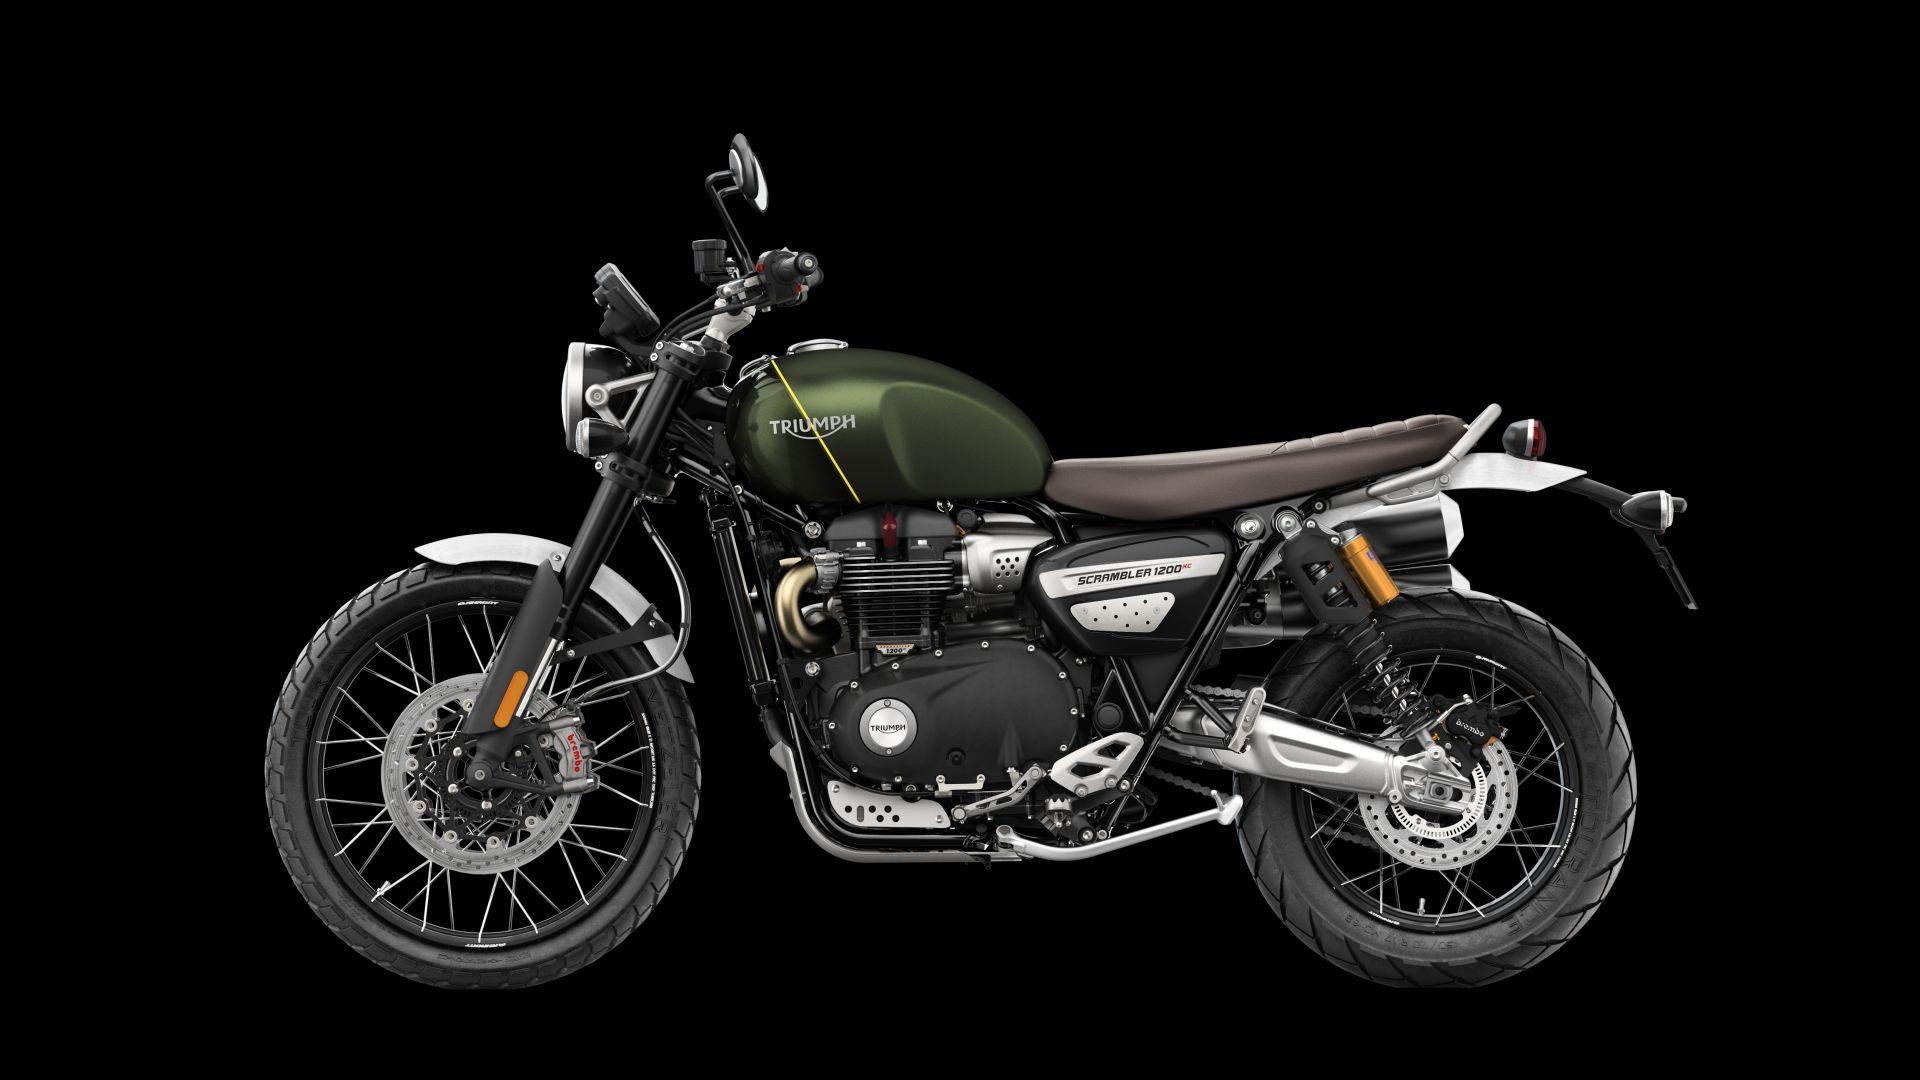 Brand New 2019 Triumph Scrambler 1200 XC at Motorcycle